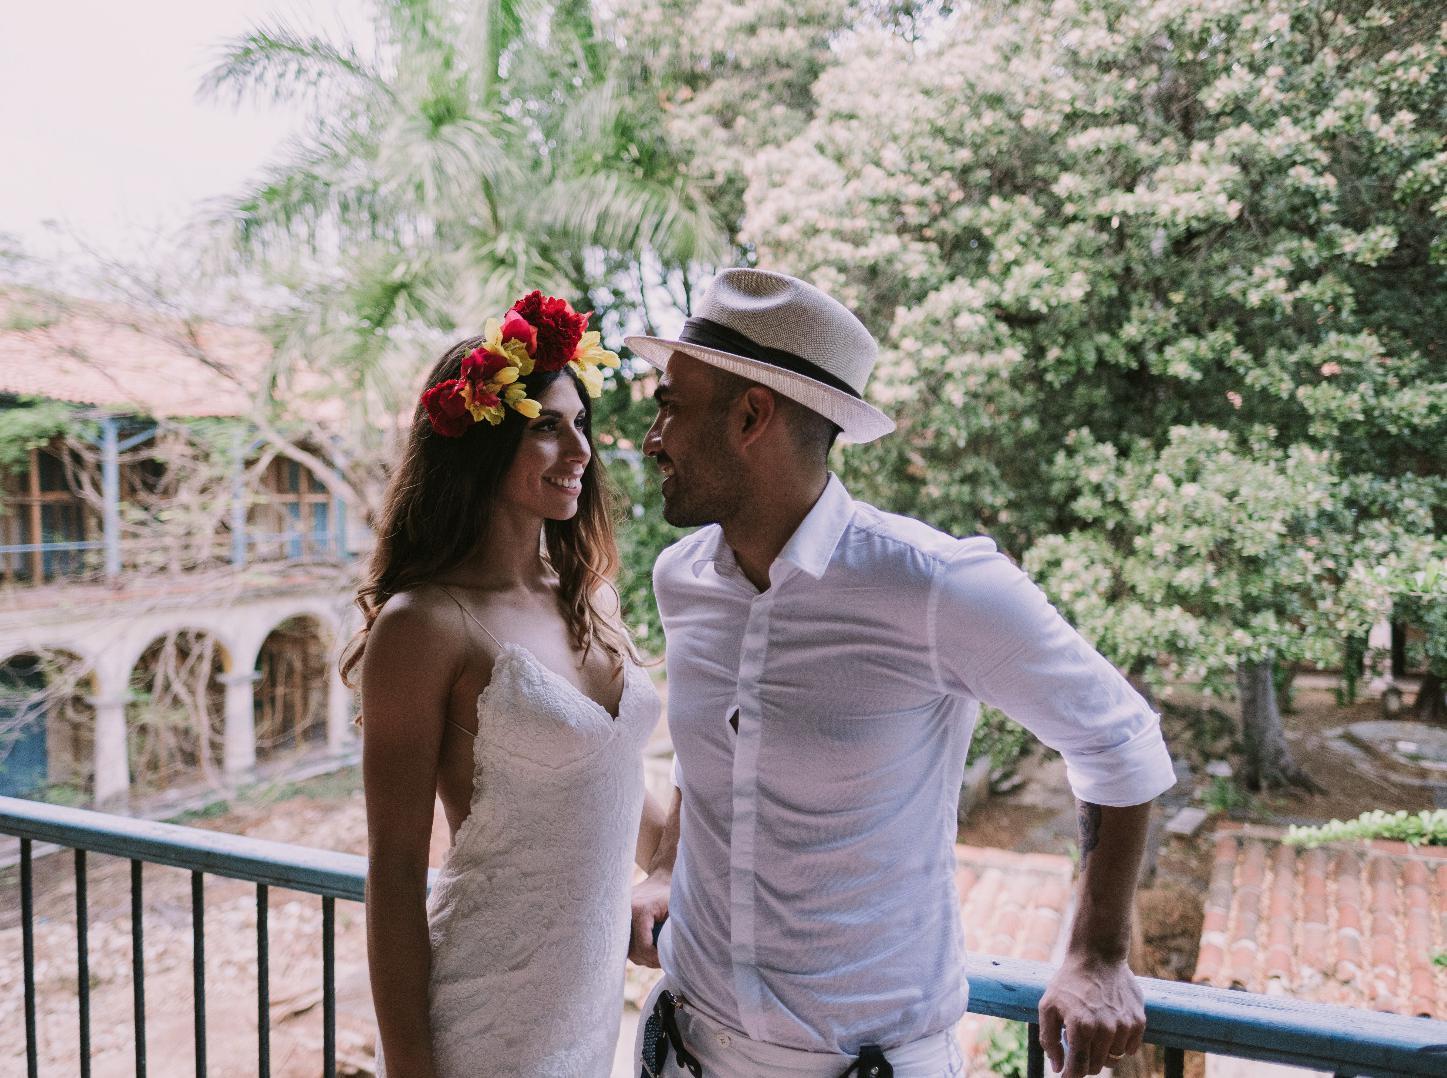 bodas-sin-clasificar-sin-tema-cuba-28971.jpg